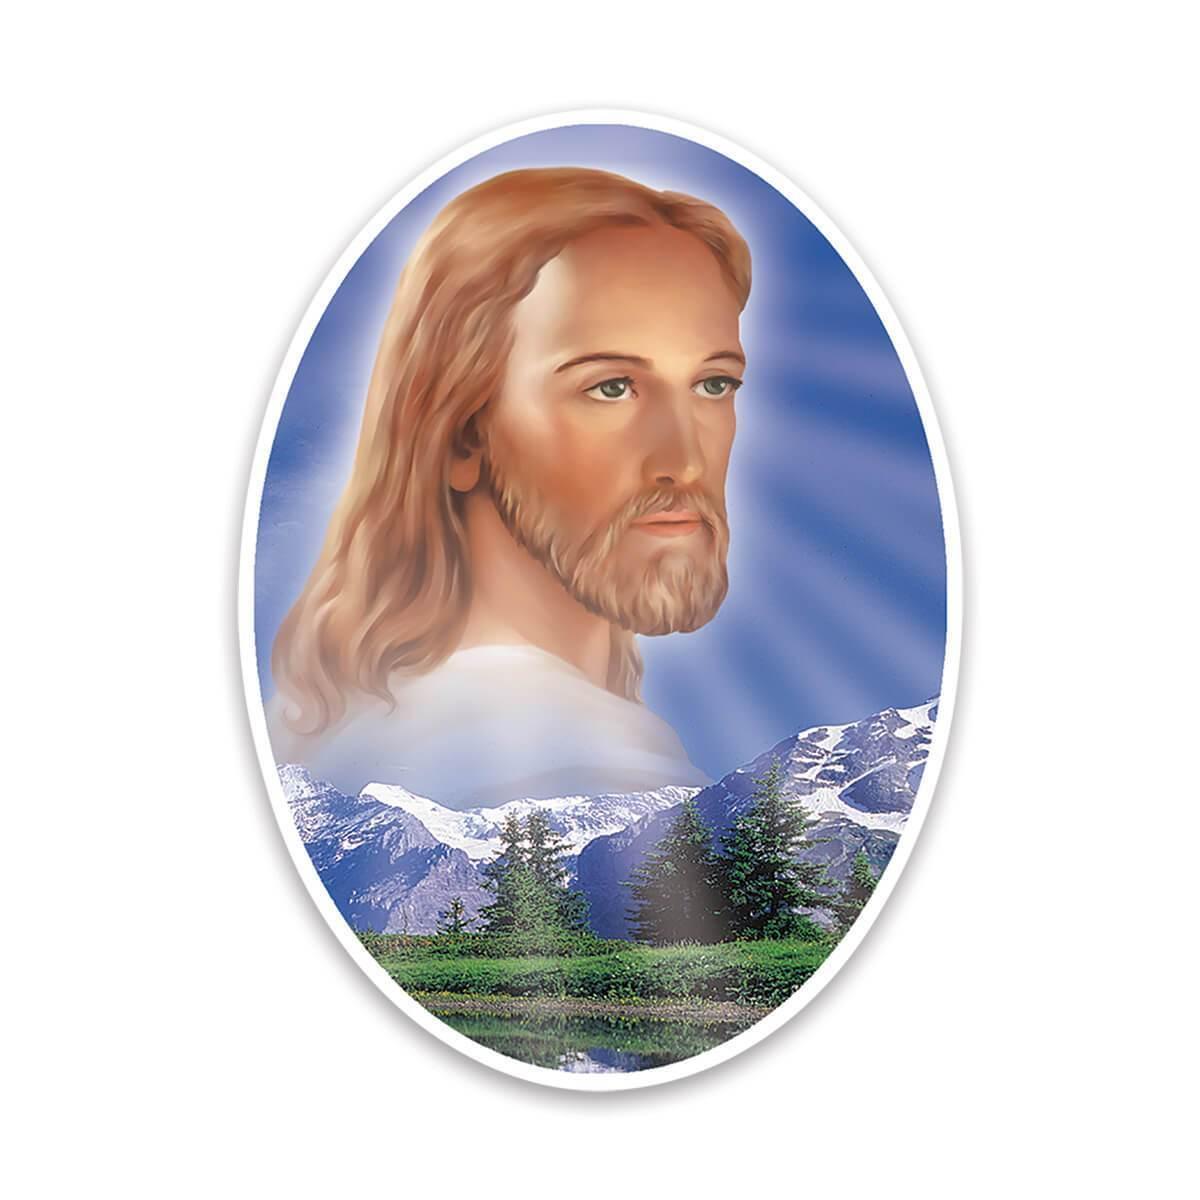 Jesus Christ : Gift Sticker Catholic Religious Saint Religion Classic Faith